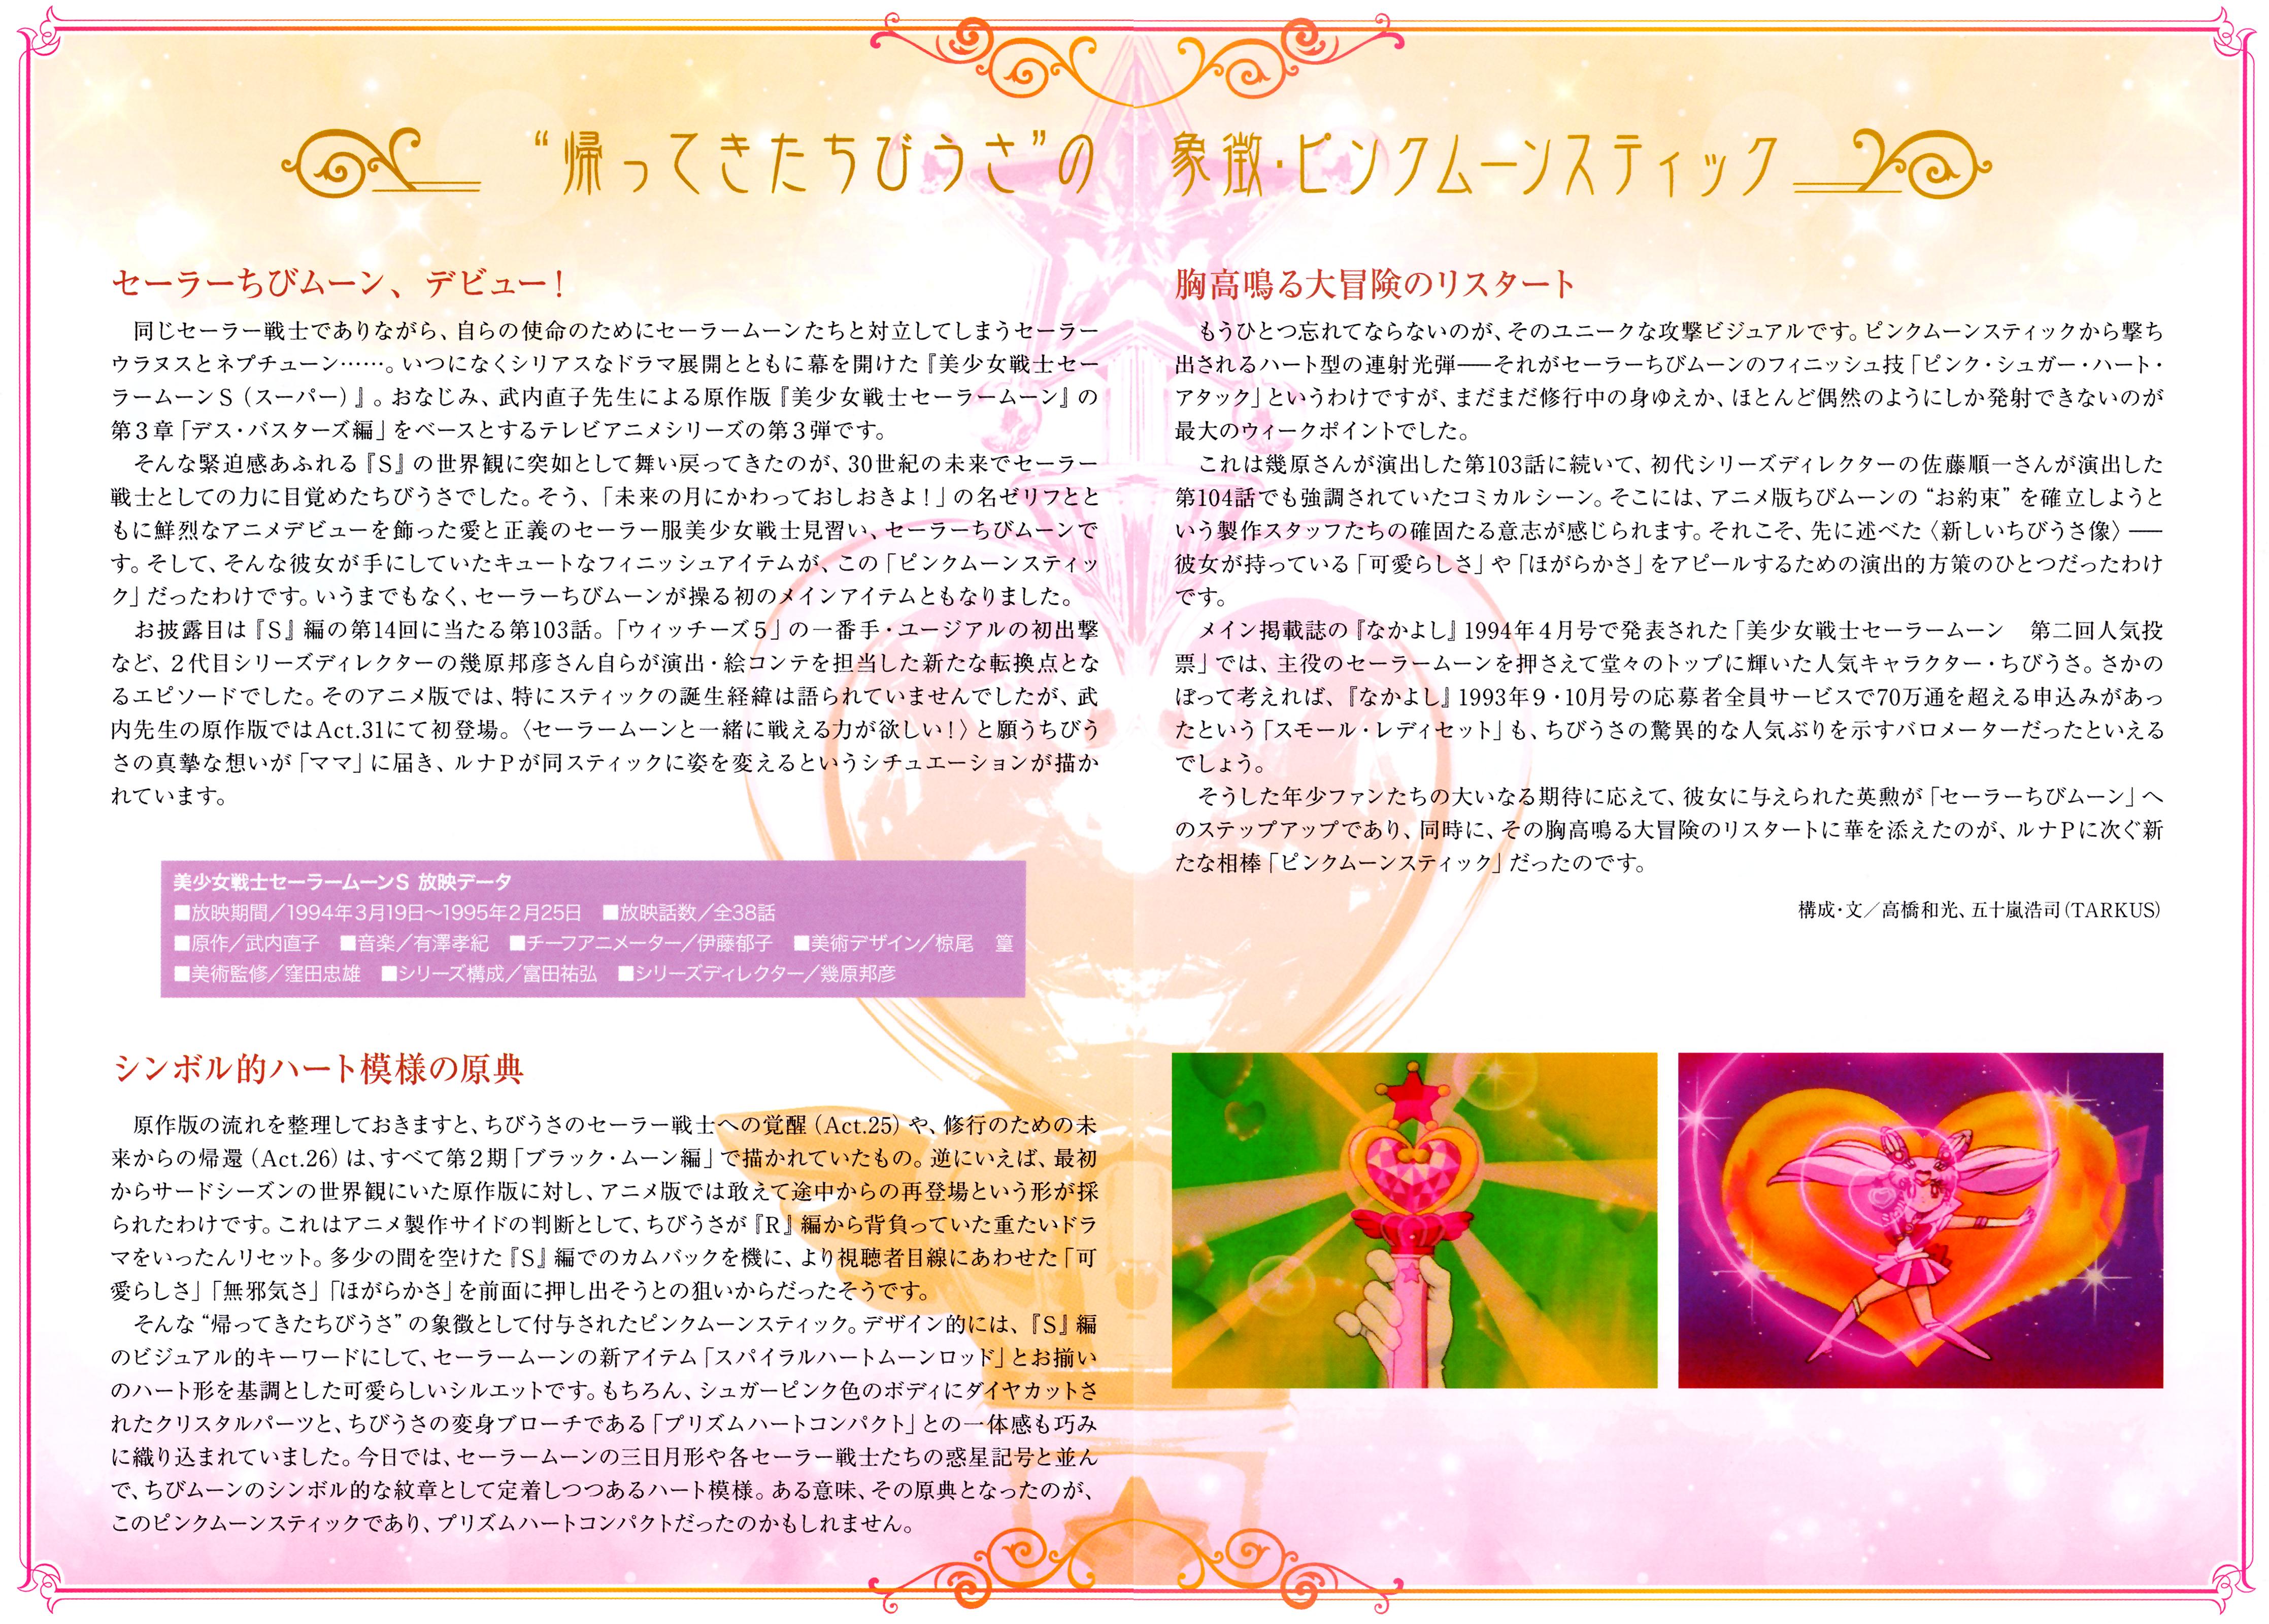 Sailormoon-pink-moon-stick-proplica-05